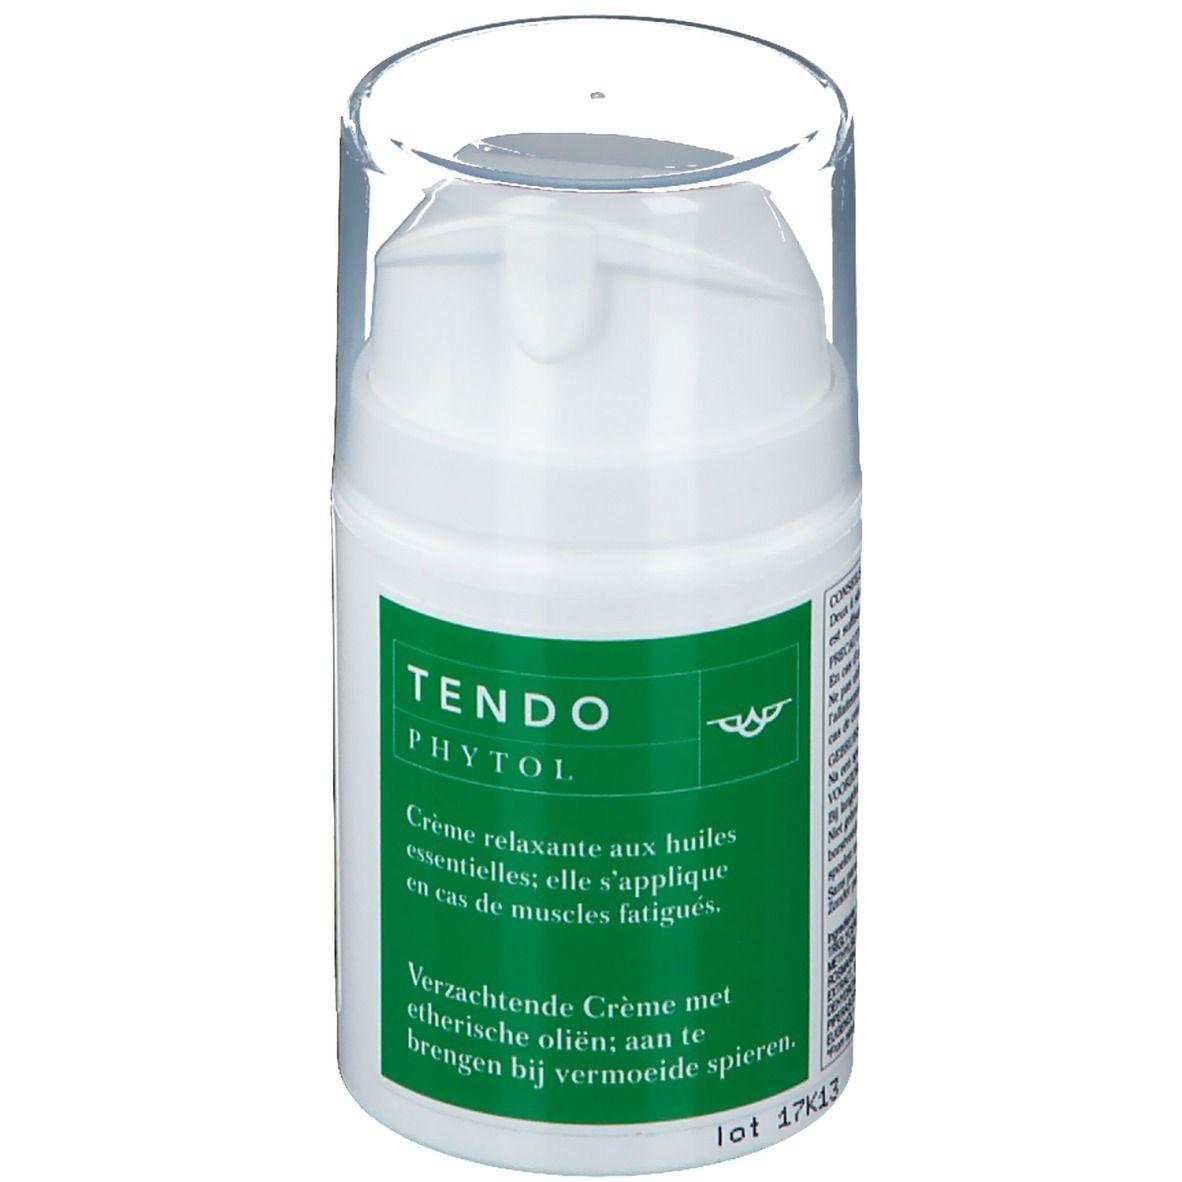 Image of Tendophytol Creme